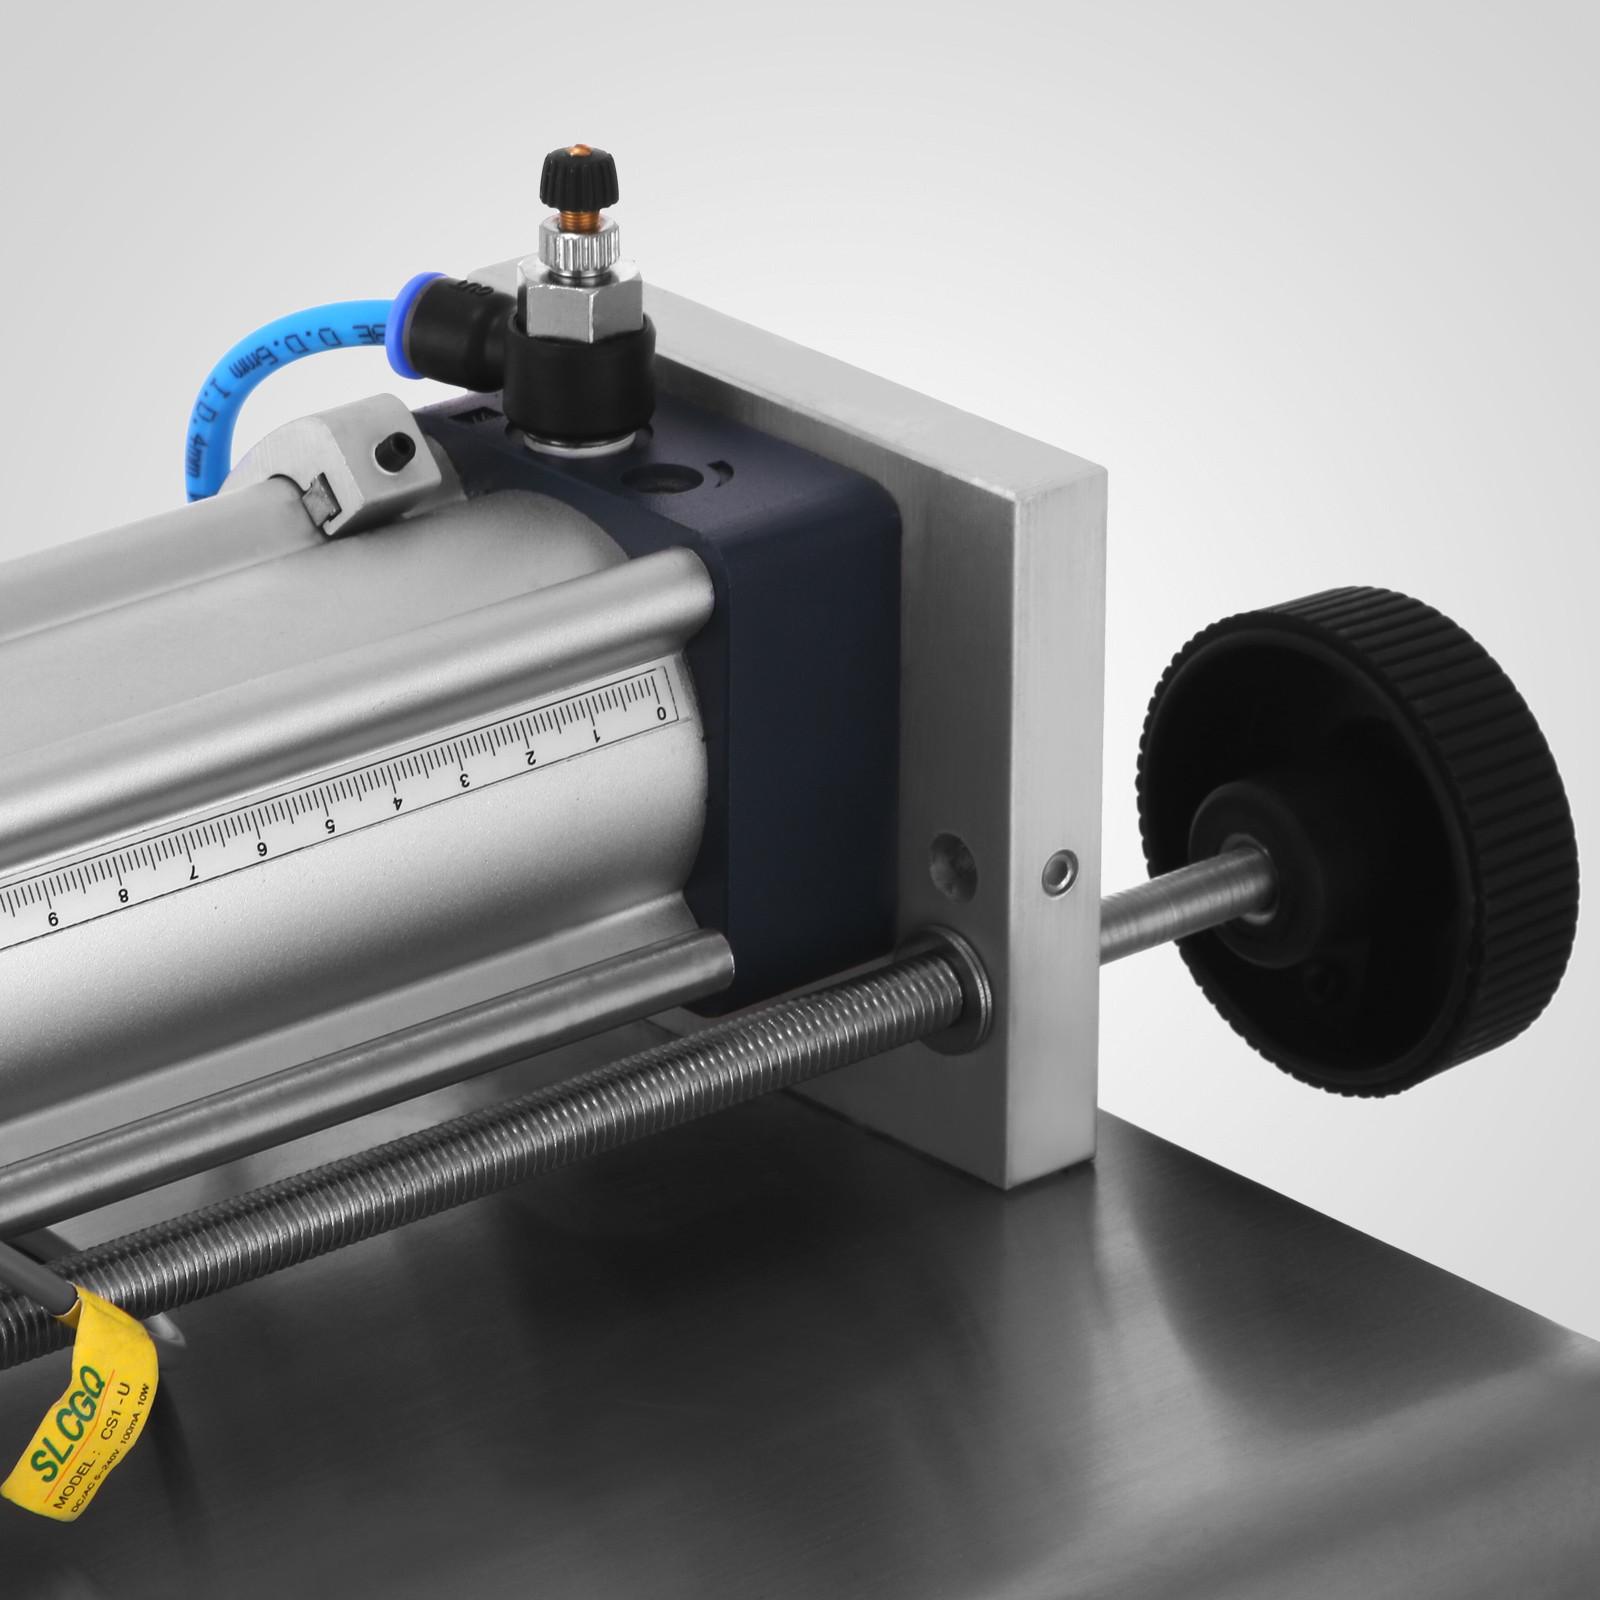 Liquid-Filling-Machine-Filler-Remplissage-2-3500ML-50-500ML-INDUSTRY-SUPPLY miniature 72